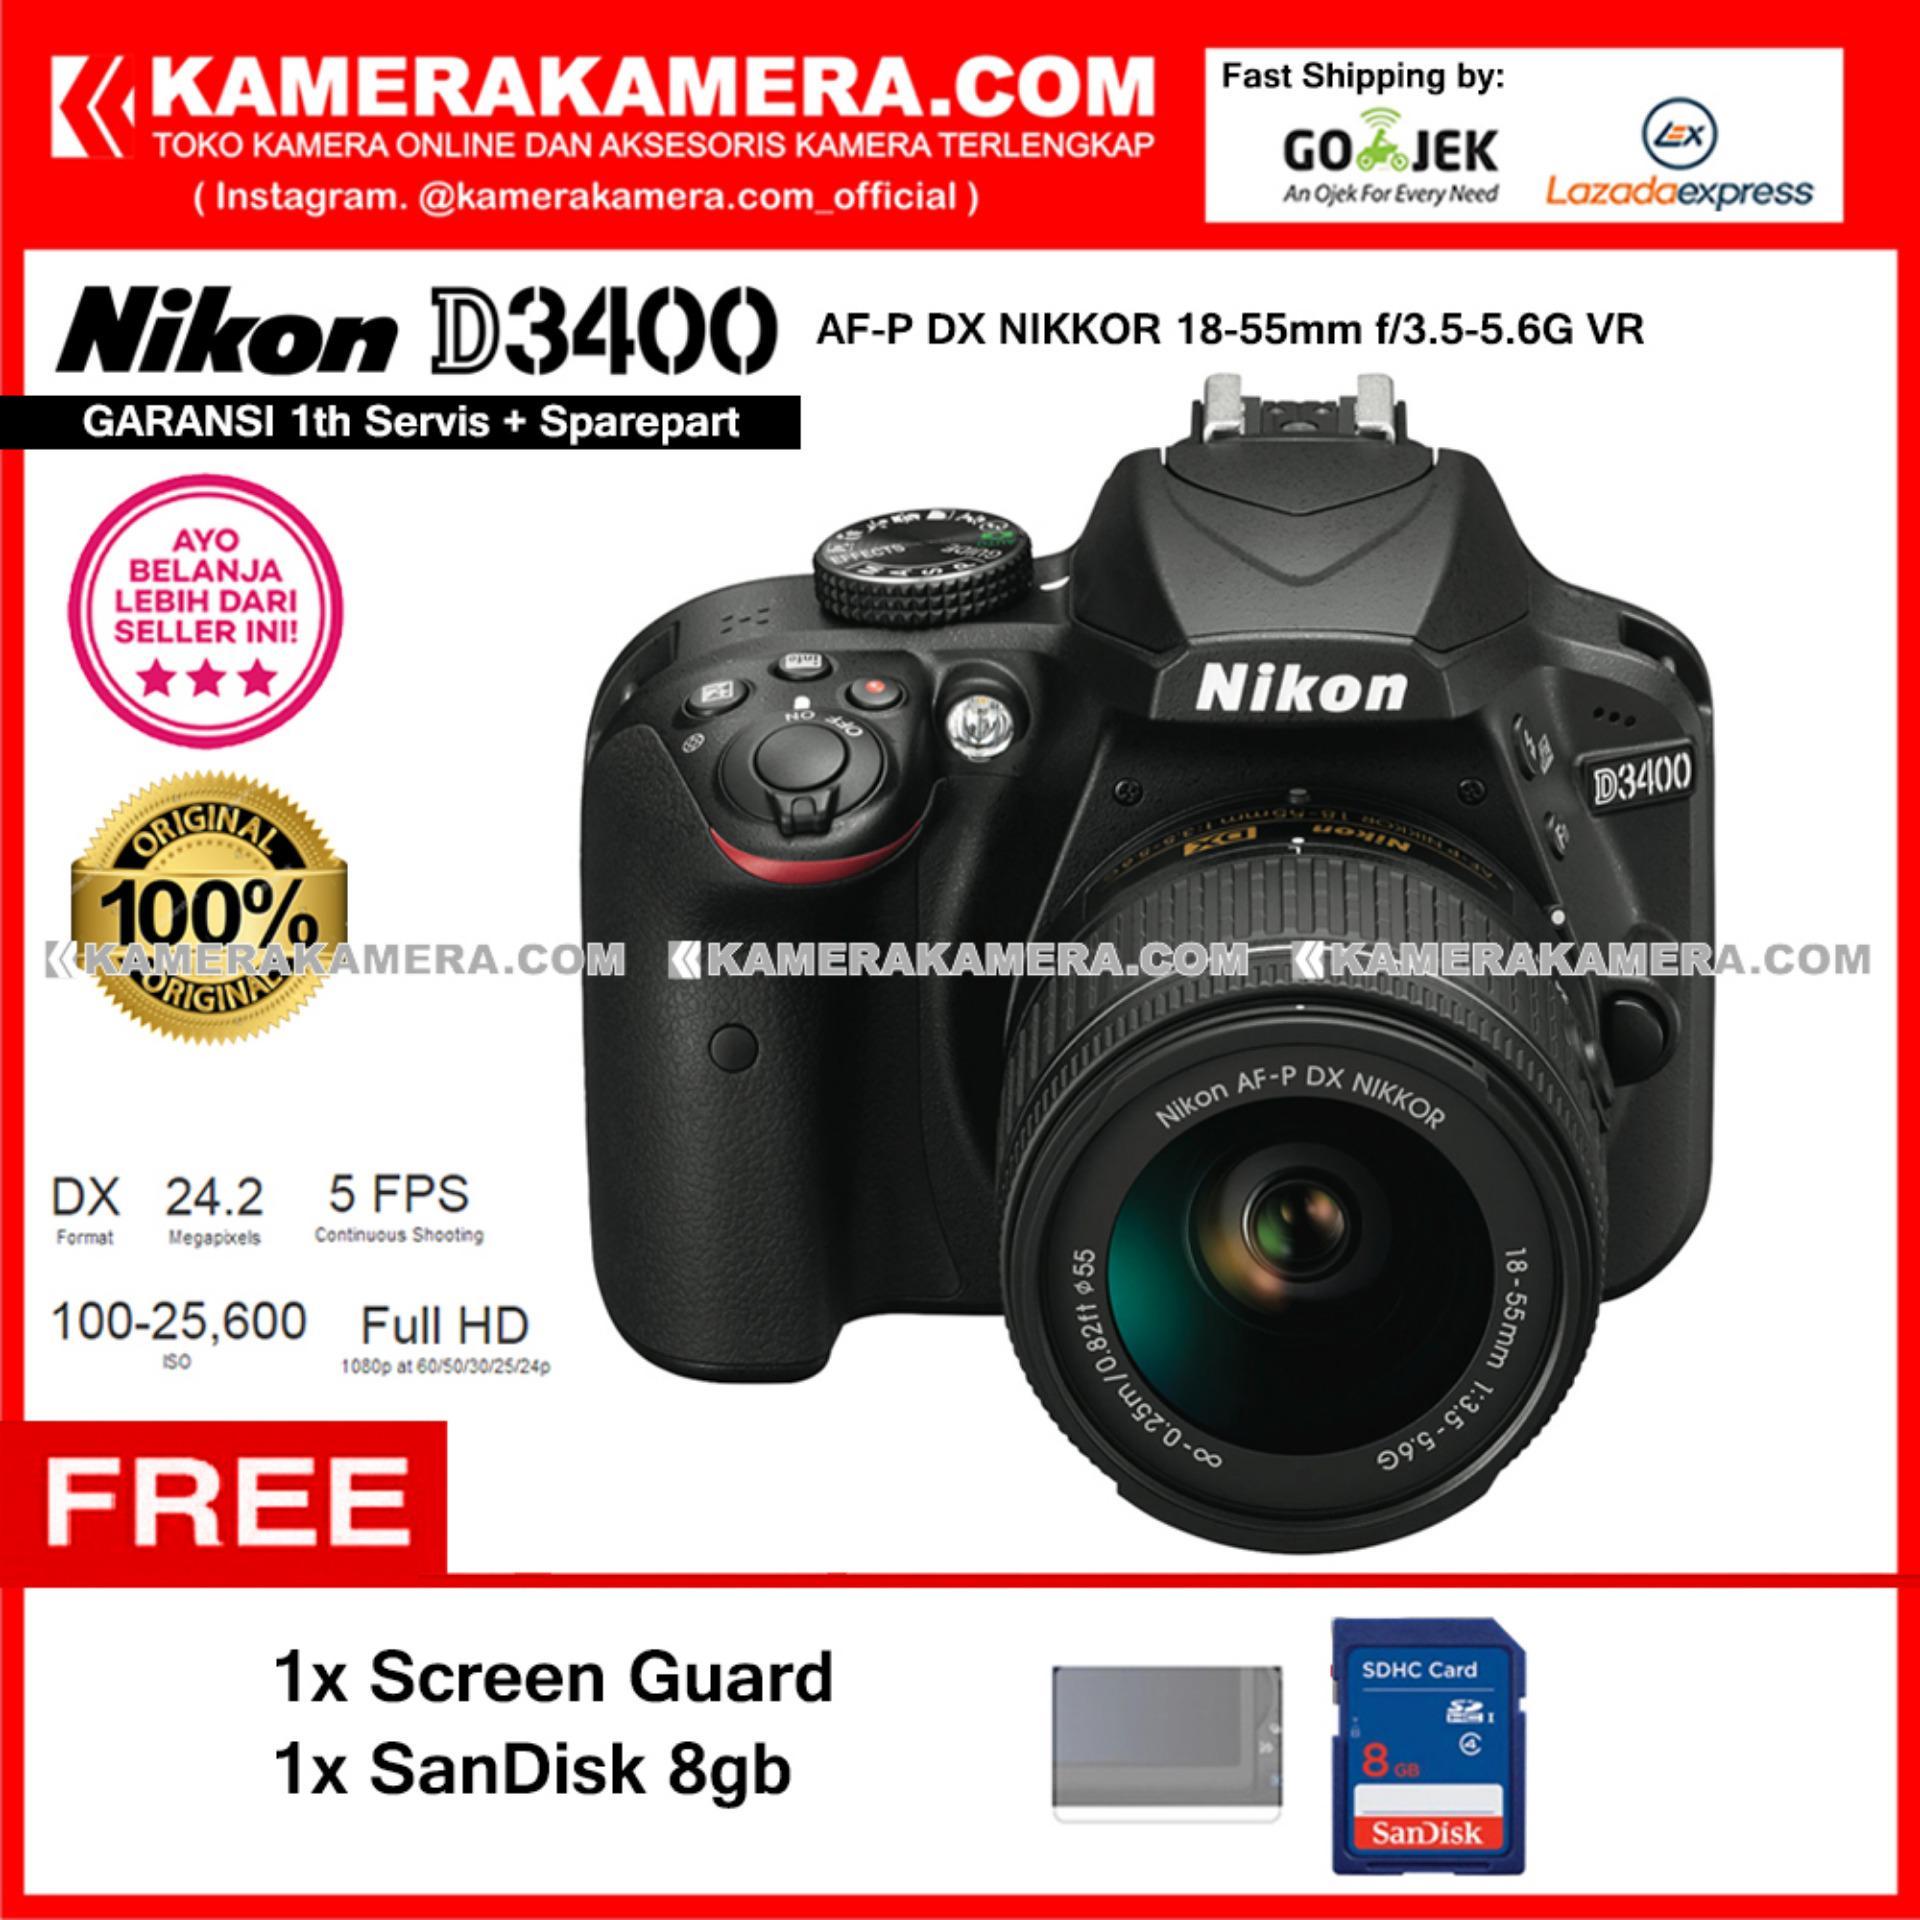 Beli sekarang Nikon D3400 AF-P DX Nikkor 18-55 VR Kit 24MP DX-format APS-C CMOS Sensor Full HD 1080p 60 fps Built-in Wireless (Garansi 1th) Free Screen ...